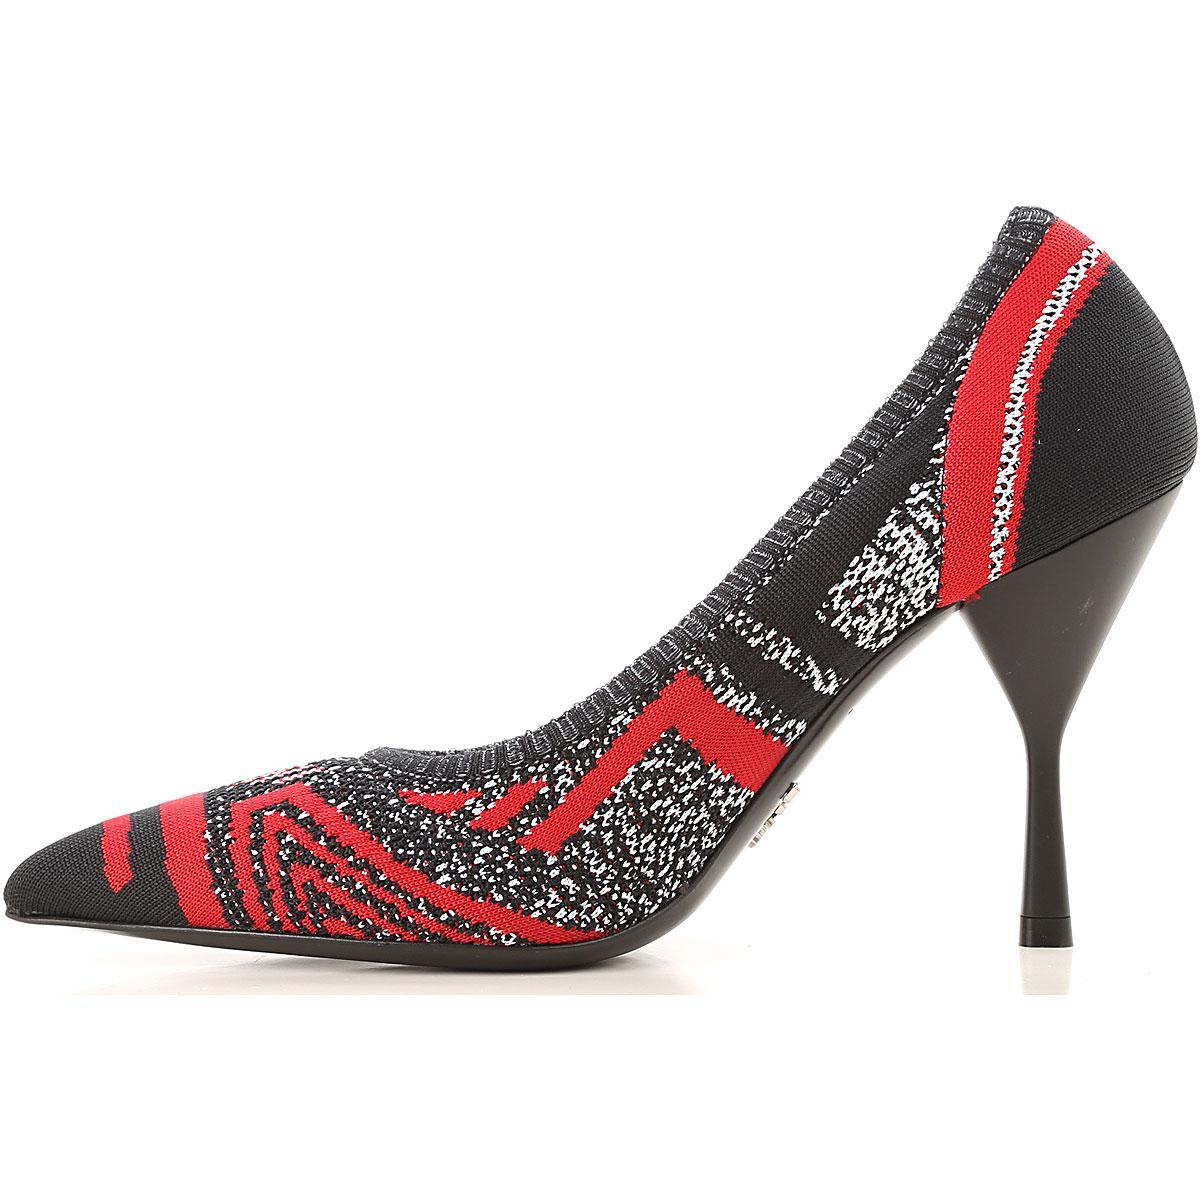 Zapatos de Tacón de Salón Baratos en Rebajas Outlet Prada de color Negro